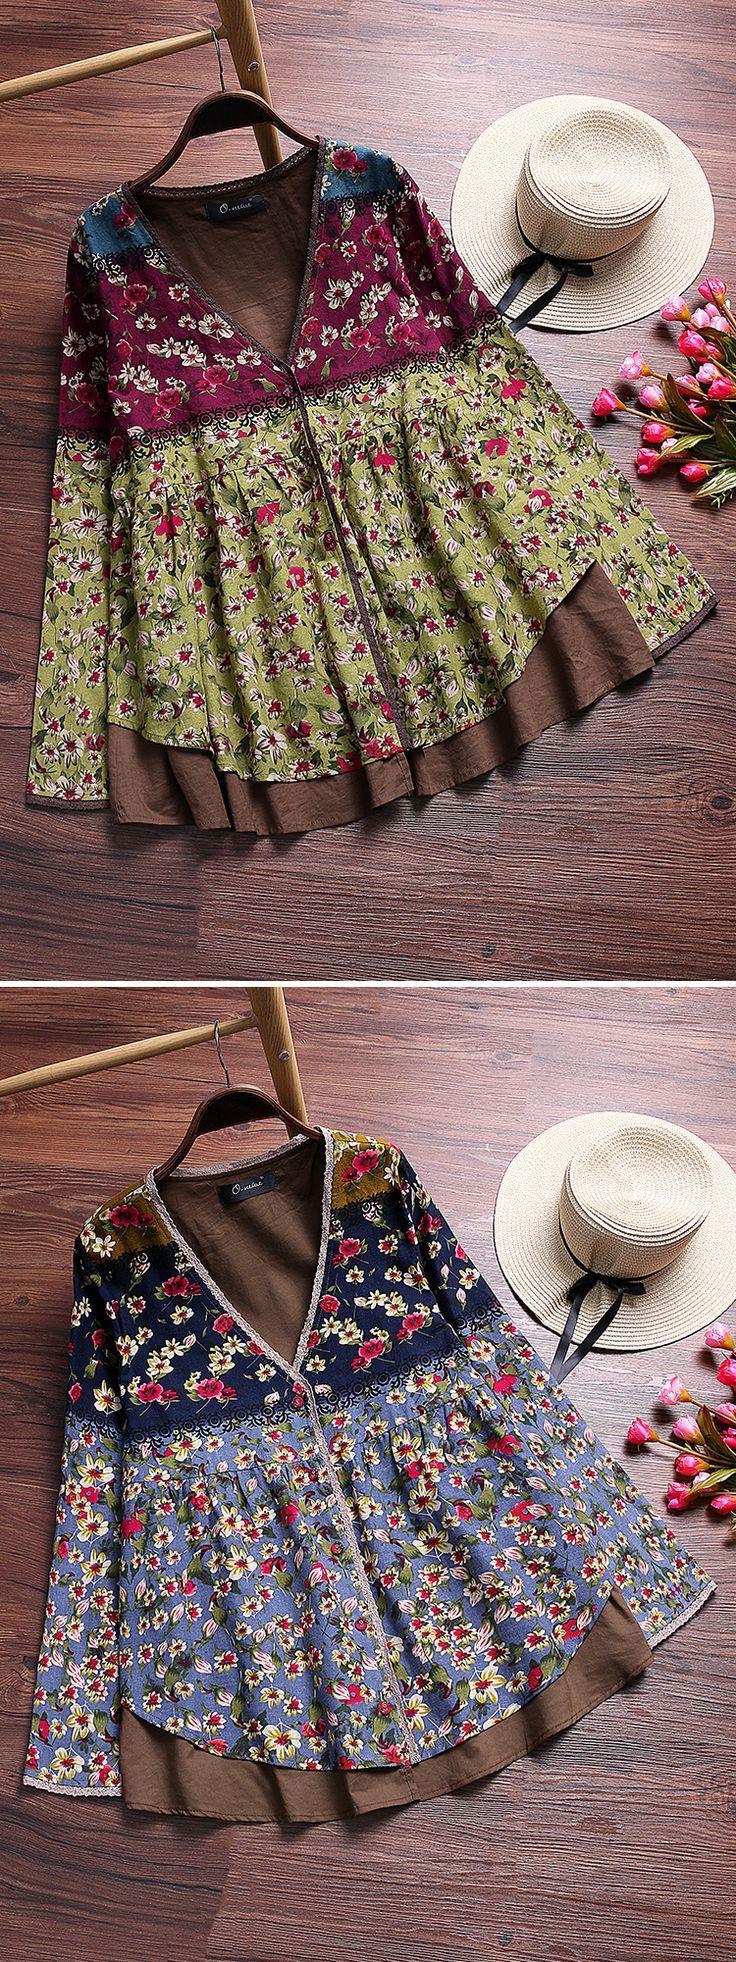 Vintage Floral Printed Patchwork V-Neck Fake Two-Piece Shirt #top #fashion South Africa Travel Para Informações Acesse nosso Site http://storelatina.com/southafrica/travelling #SouthAfricaTravel #viajeafrica